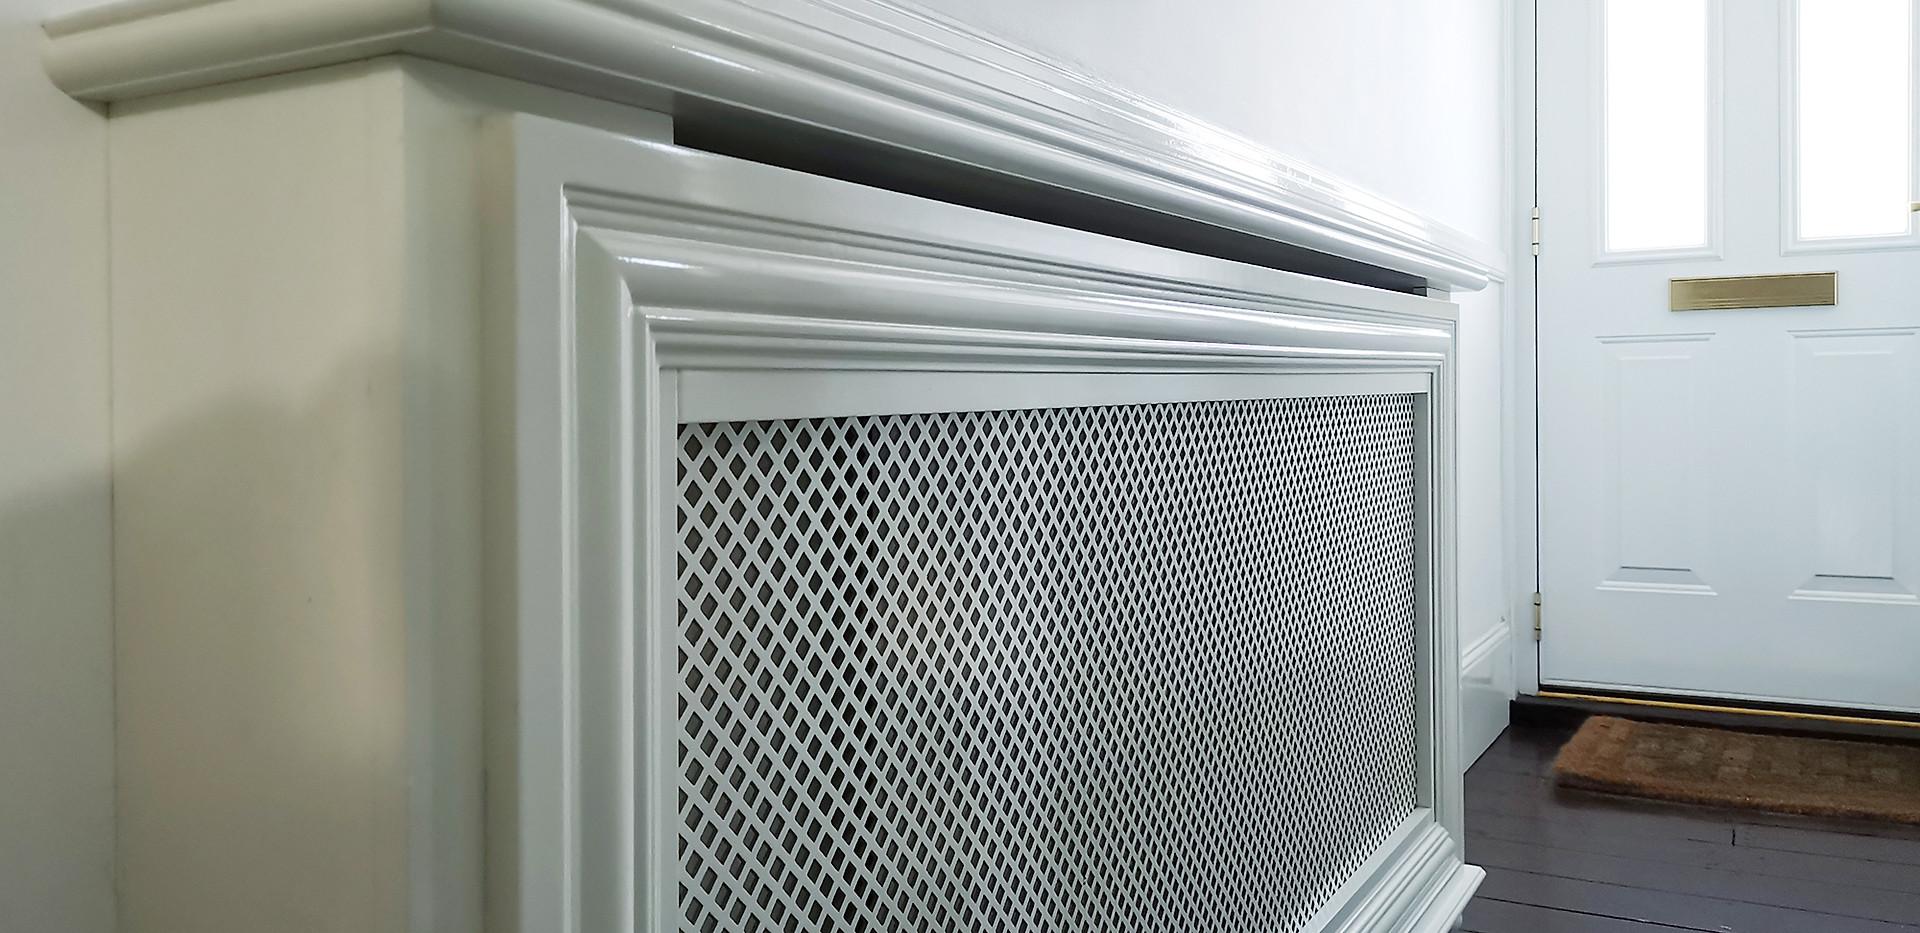 1 radiator cover build.jpg